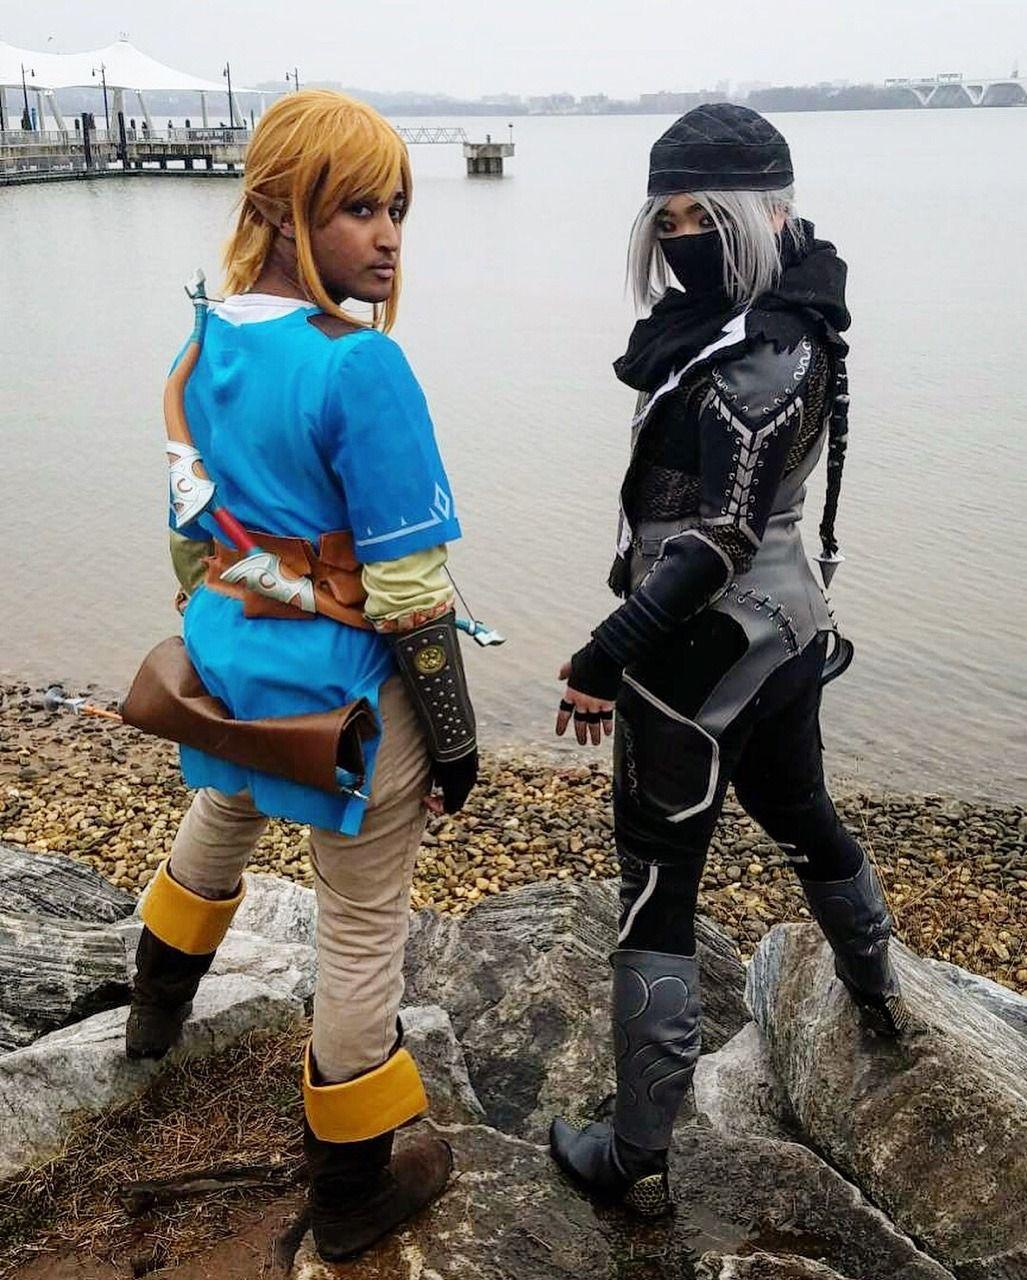 Link Legend Of Zelda Sheik Loz Cosplay Loz Cosplay Sheik Cosplay